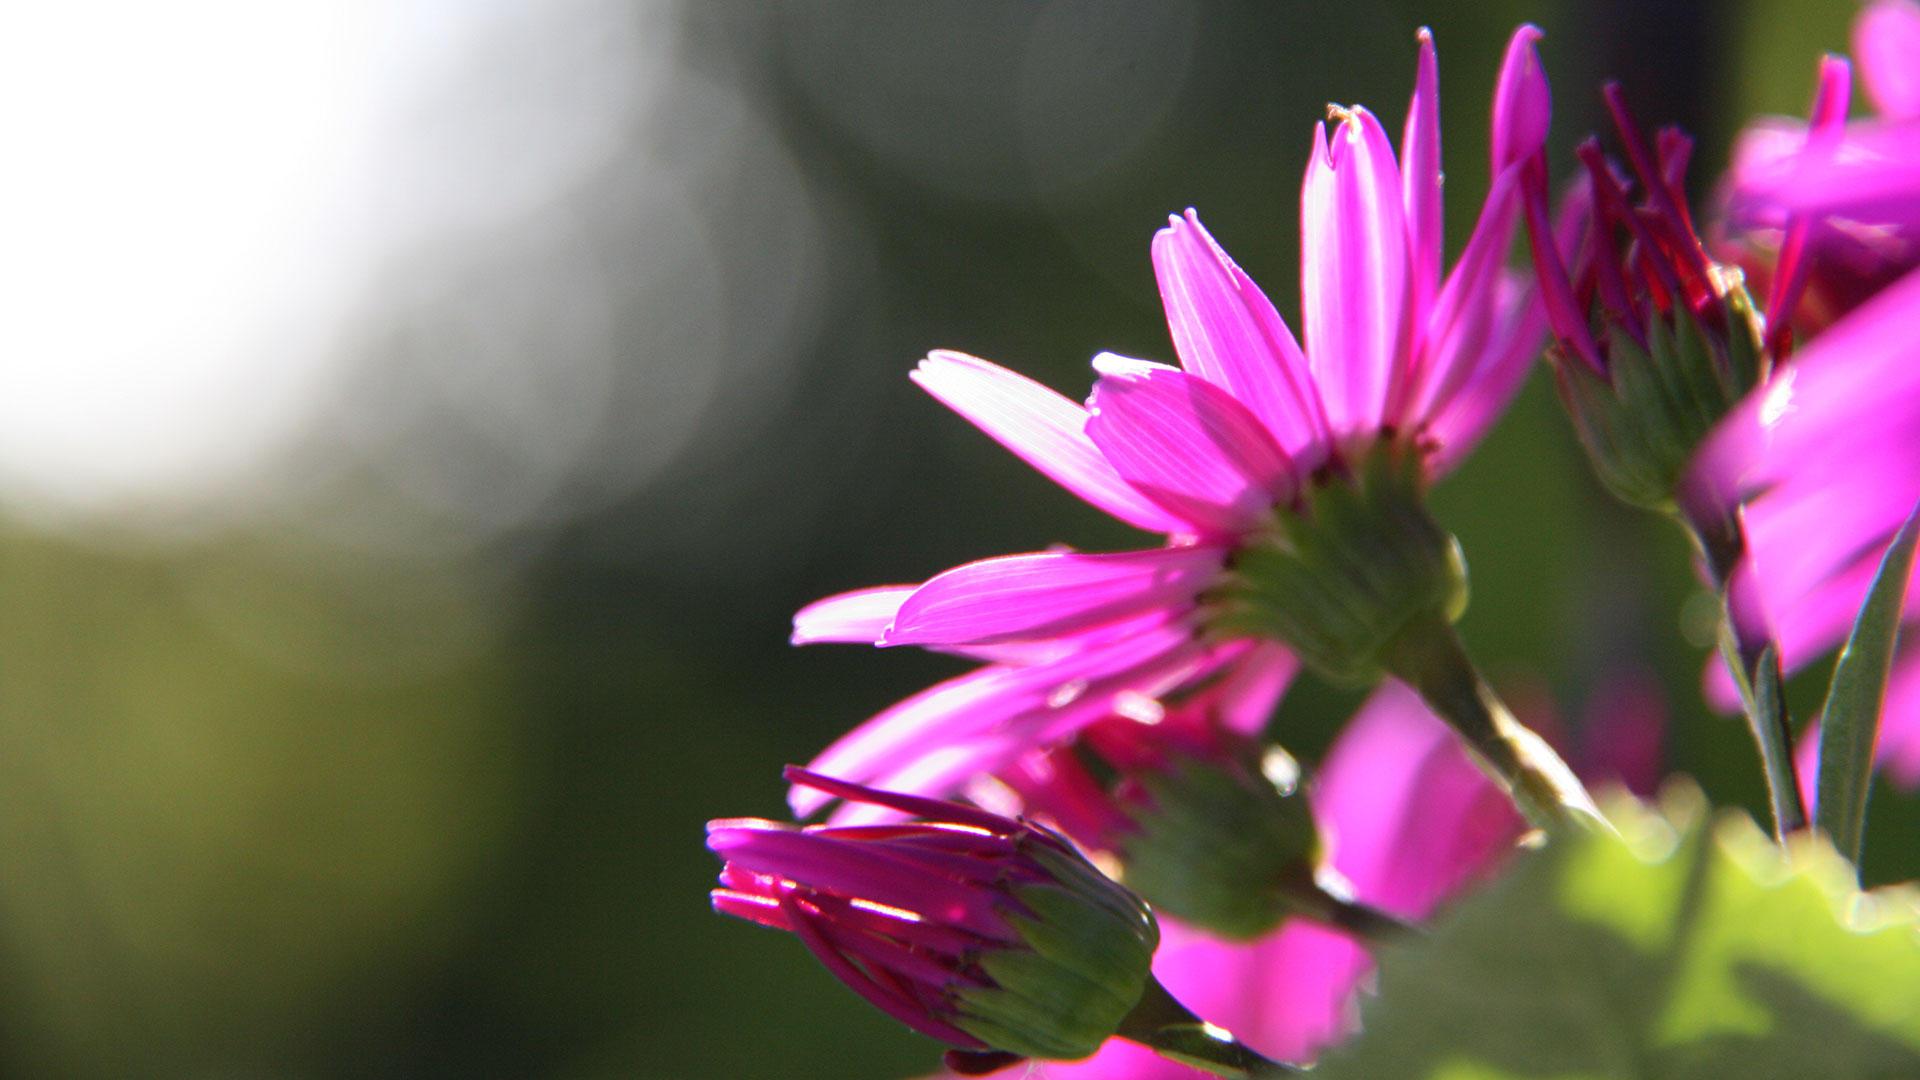 Purple daisies in the sun